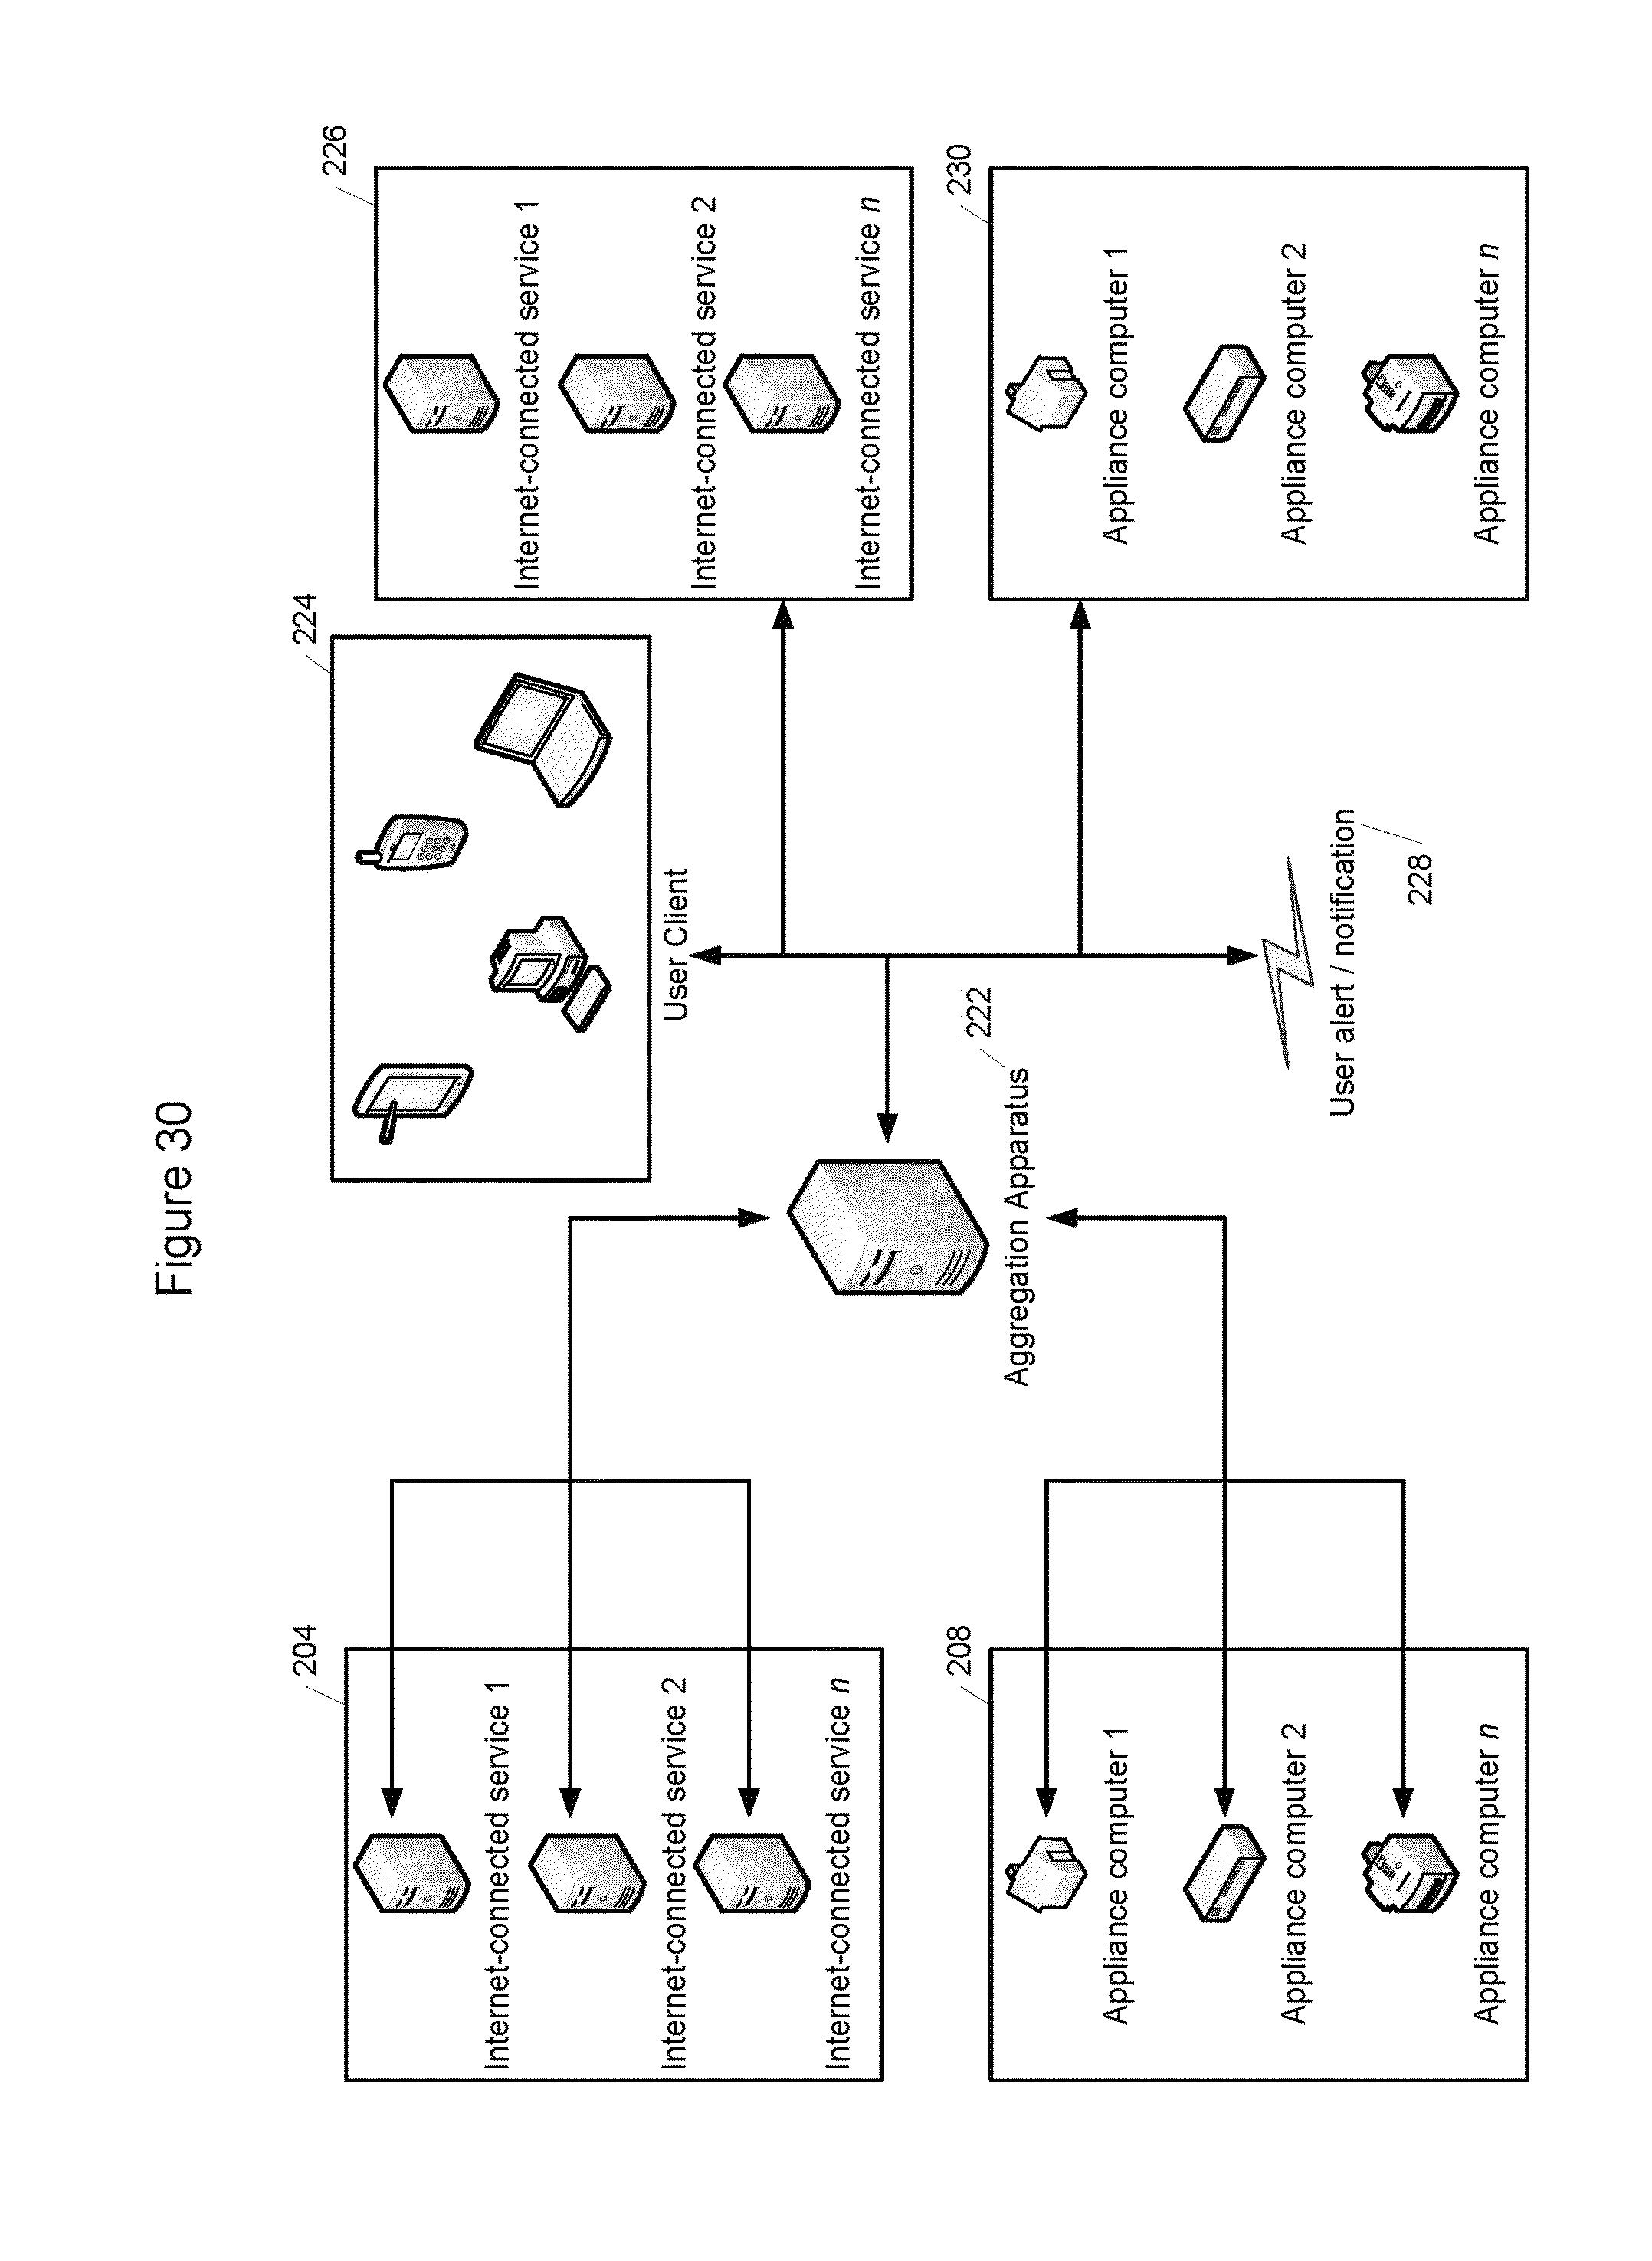 Patent US 8,996,654 B2